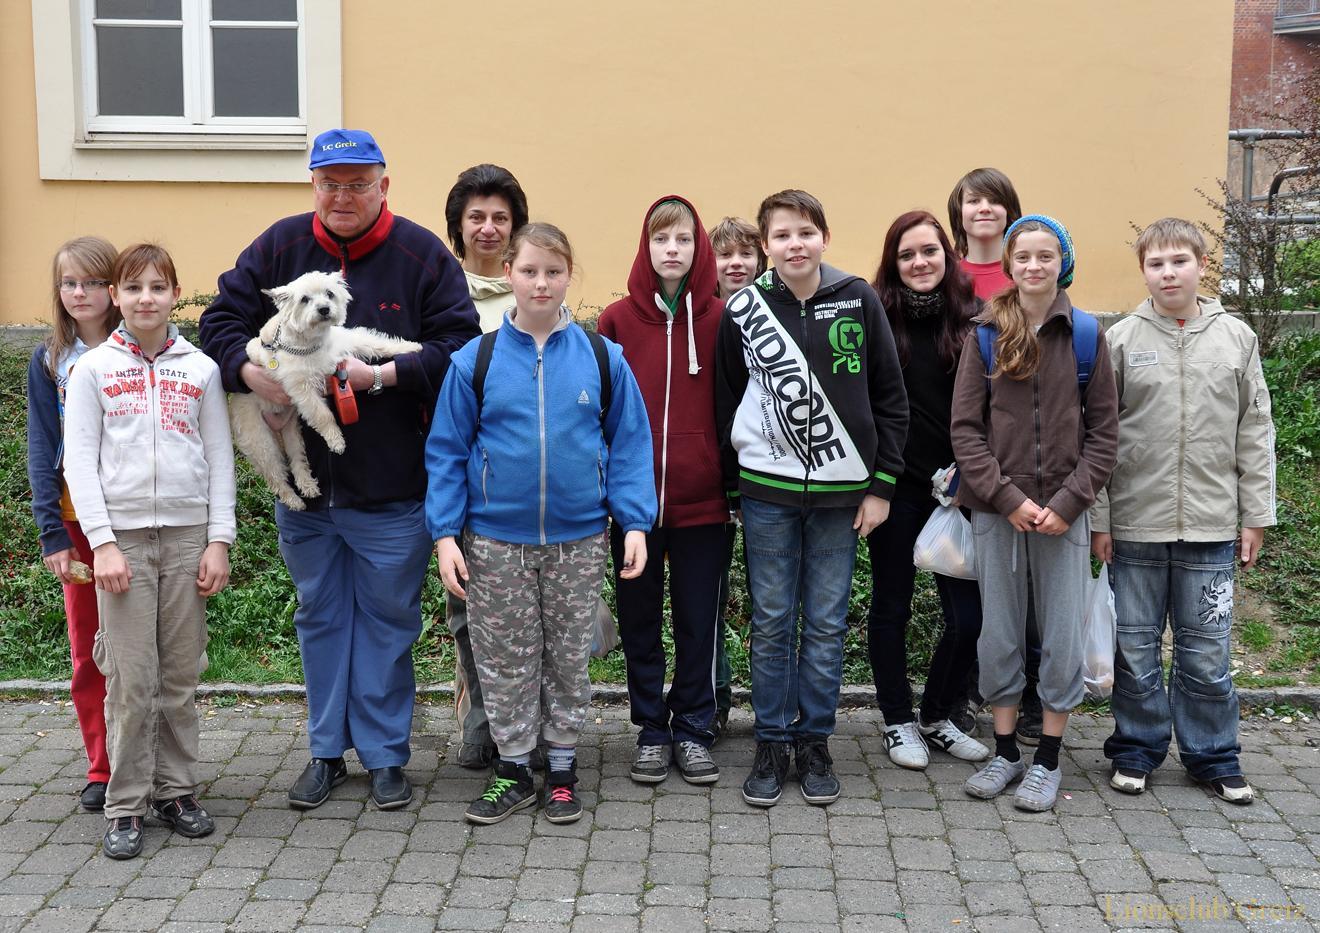 Lionsclub Greiz rief zum Frühjahrsputz auf